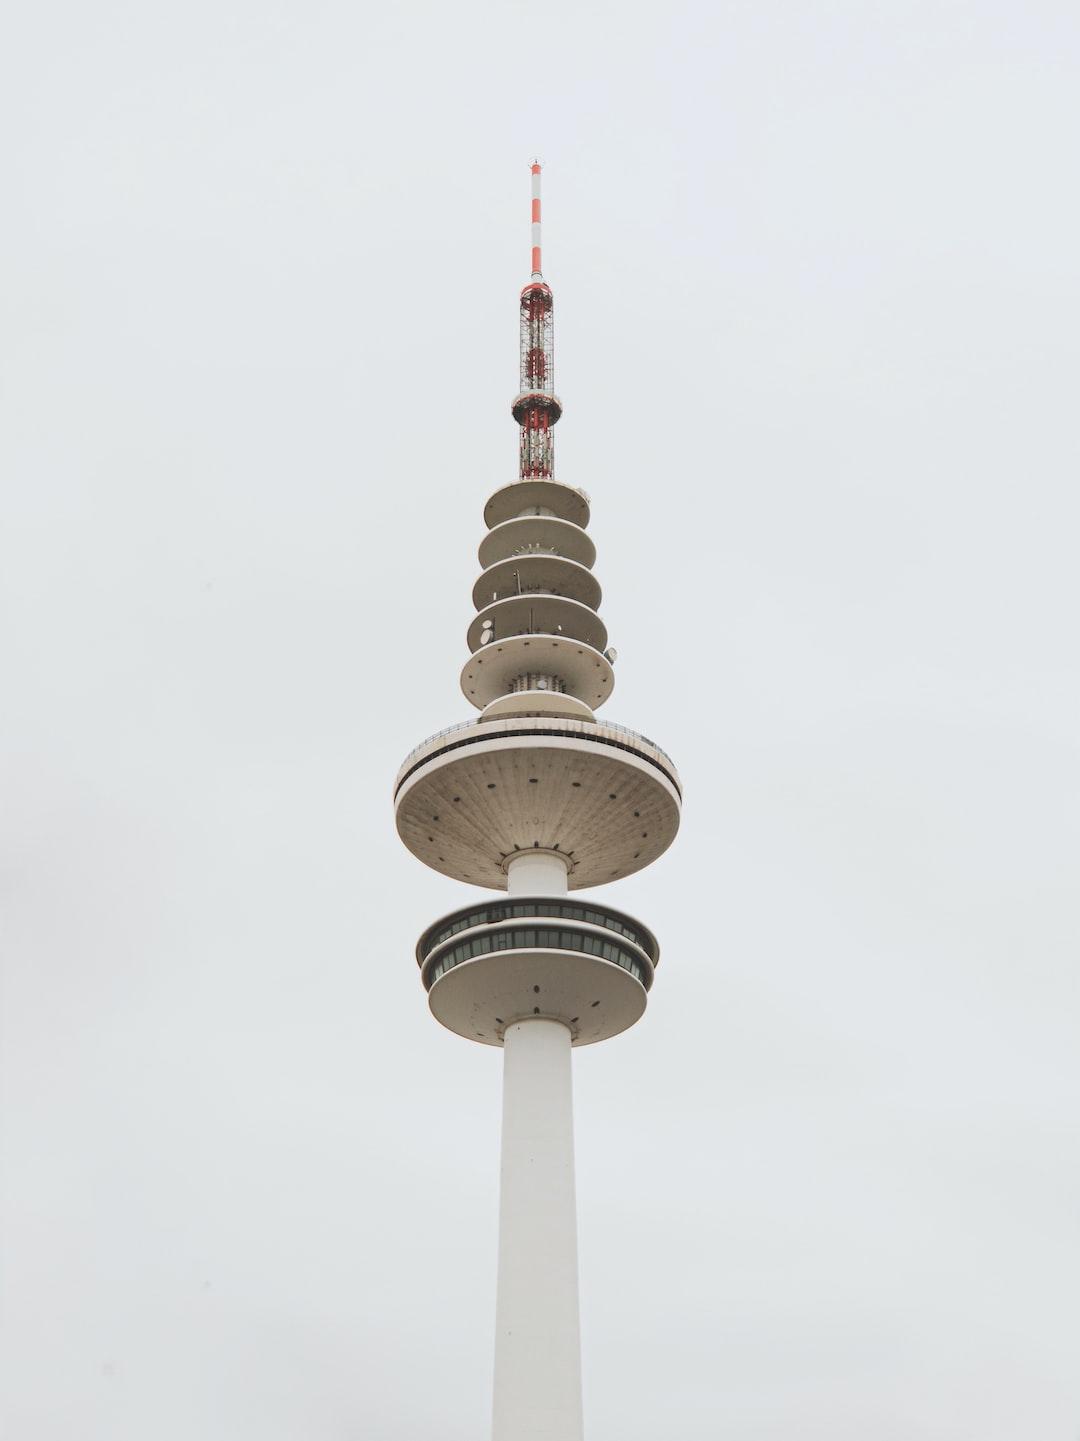 The Heinrich-Hertz-Tower in Hamburg, Germany!